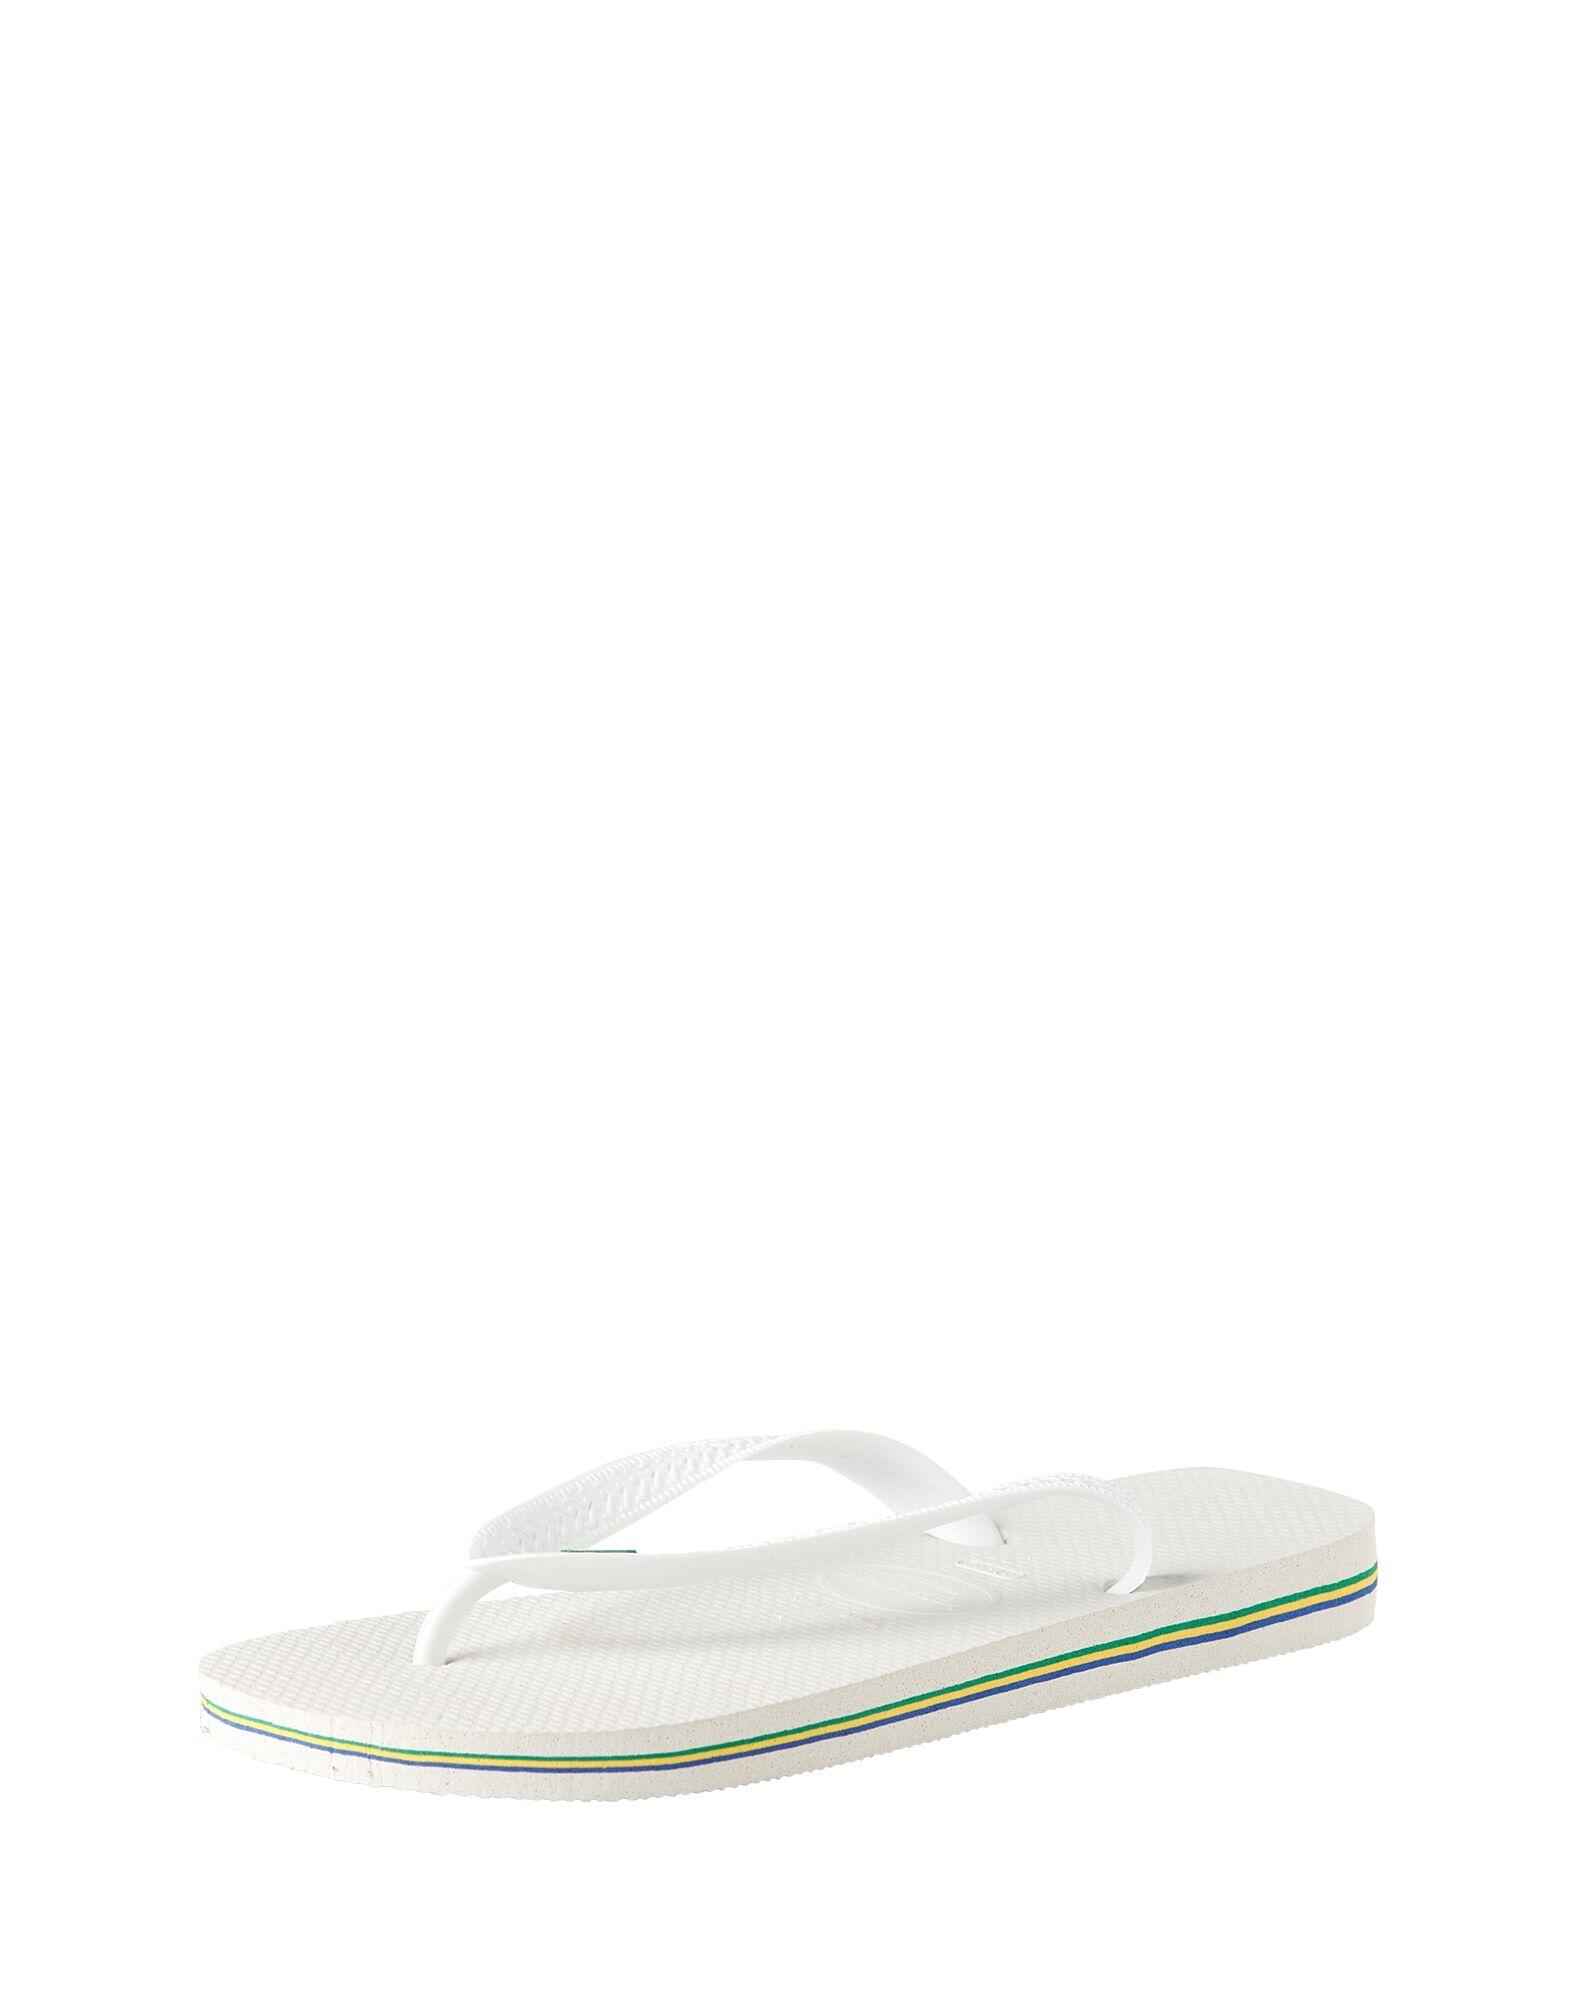 HAVAIANAS Tongs 'Brasil'  - Blanc - Taille: 35.5 - female